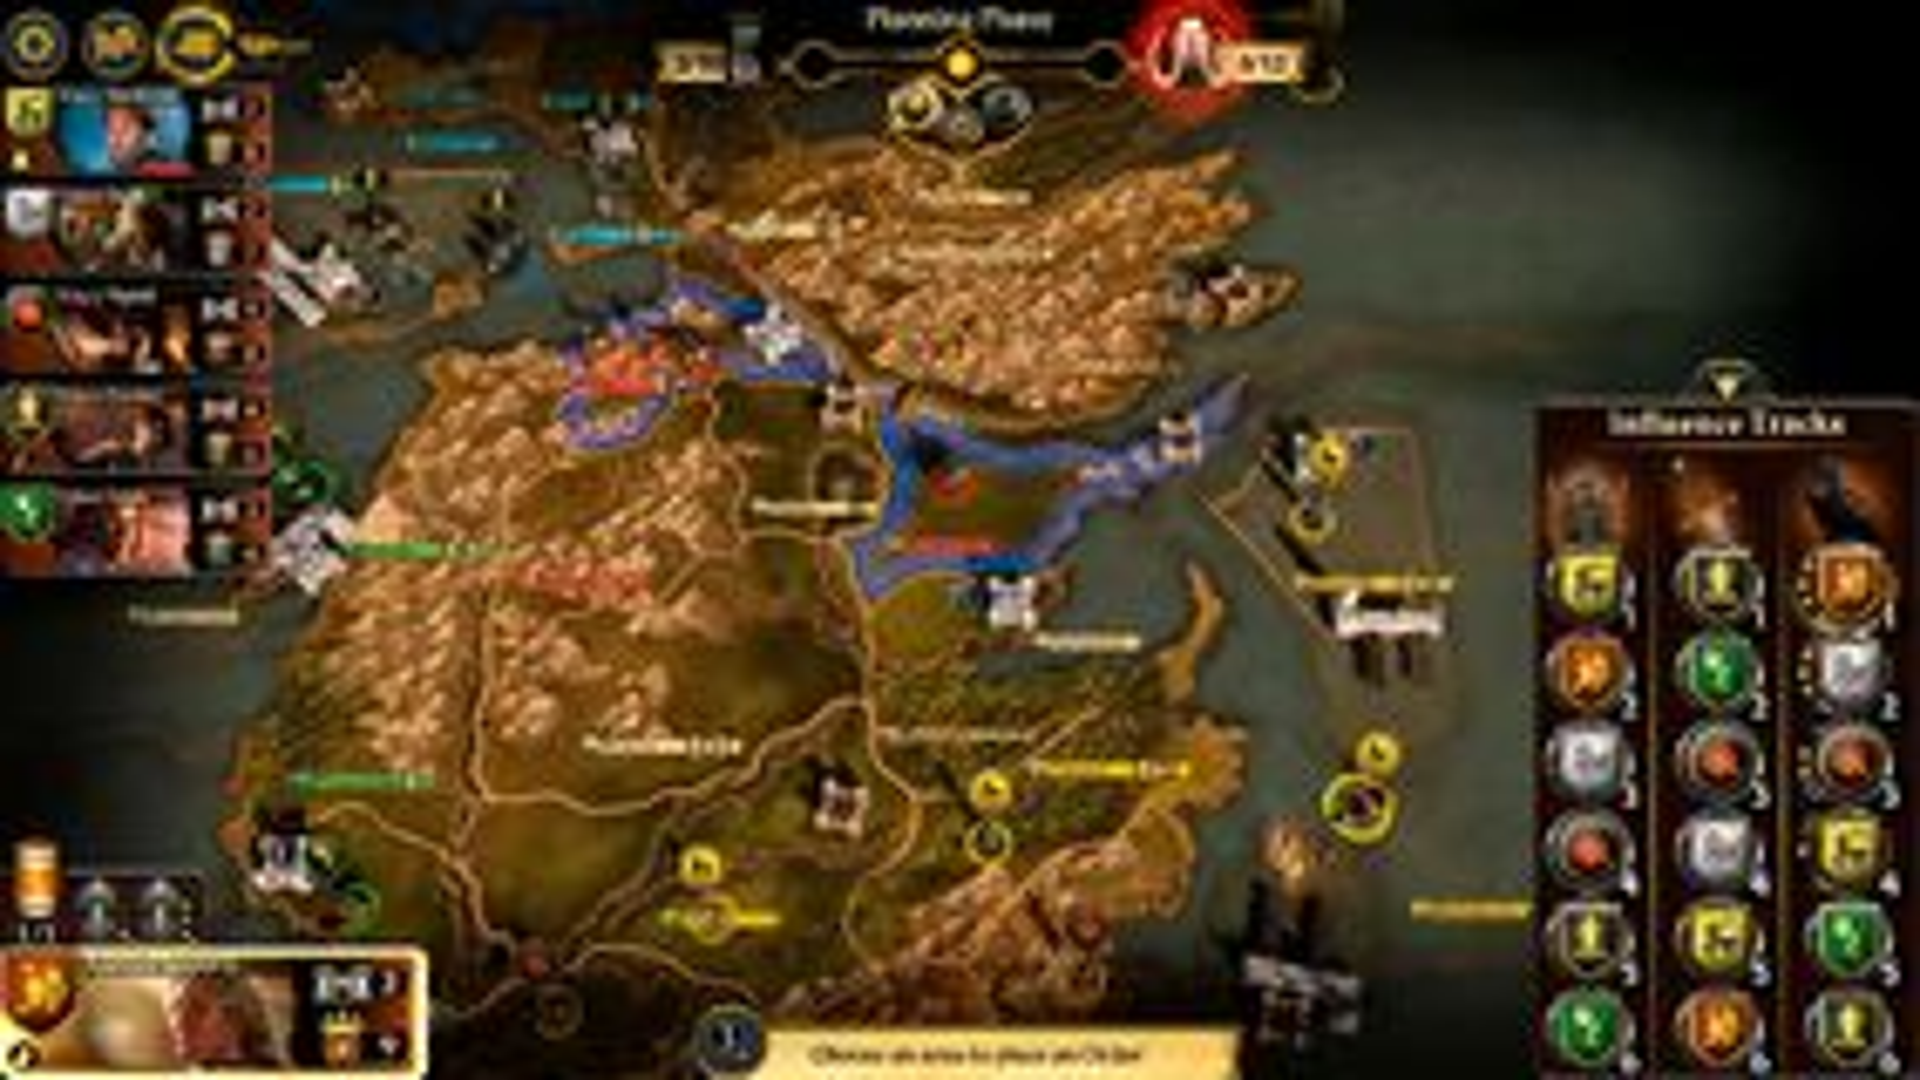 game-of-thrones-board-game-digital-edition-screenshot.jpg